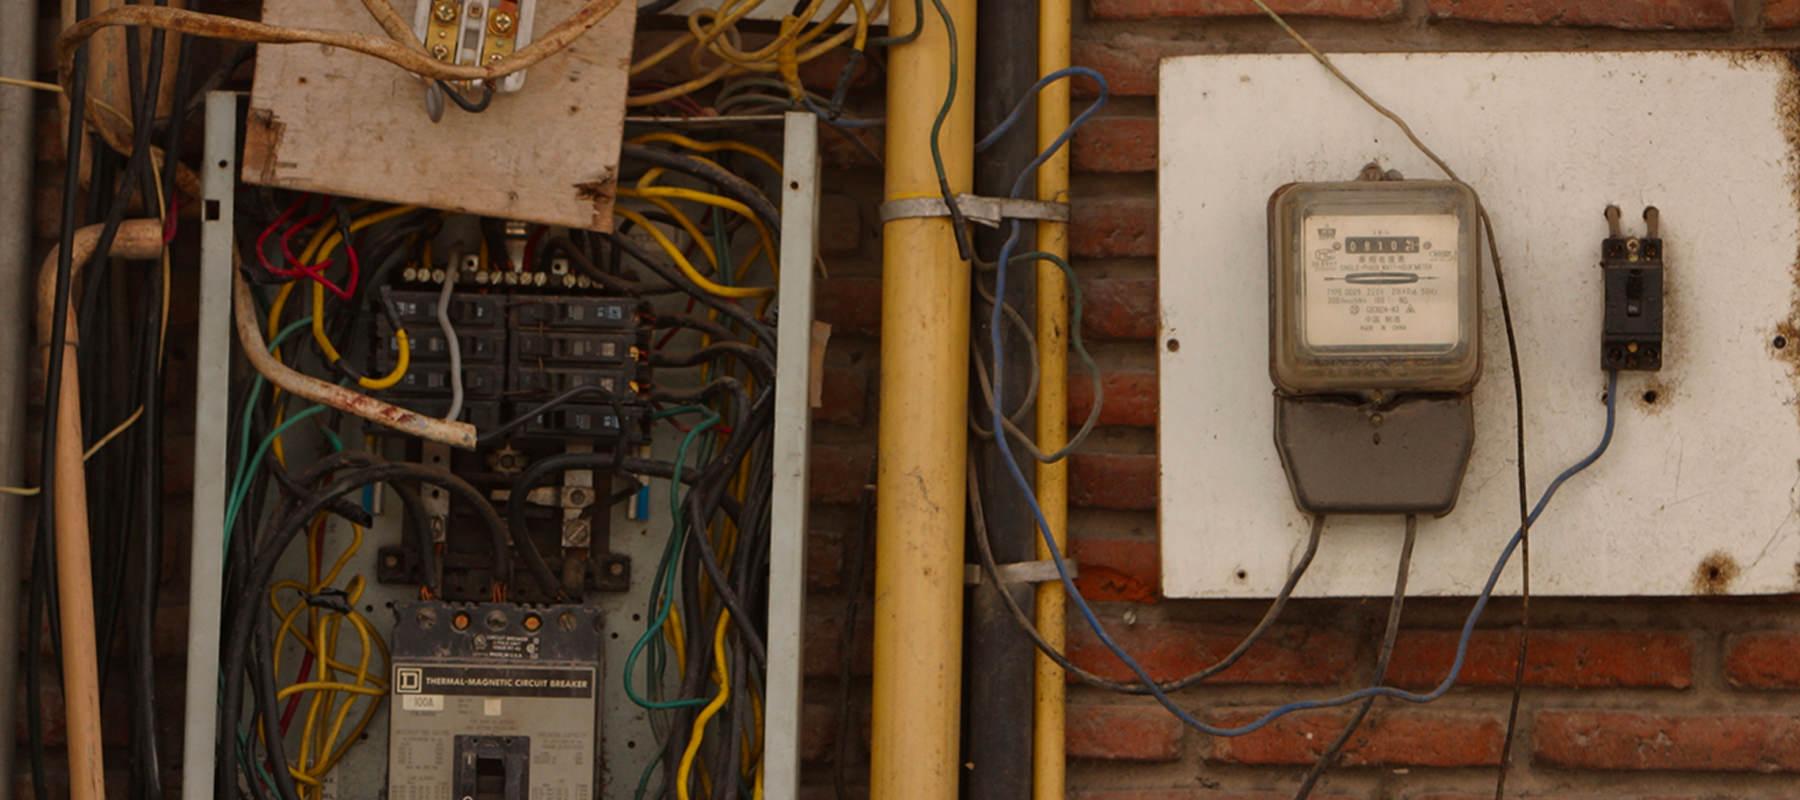 Blown Circuit Breaker Fuse | US Electrical